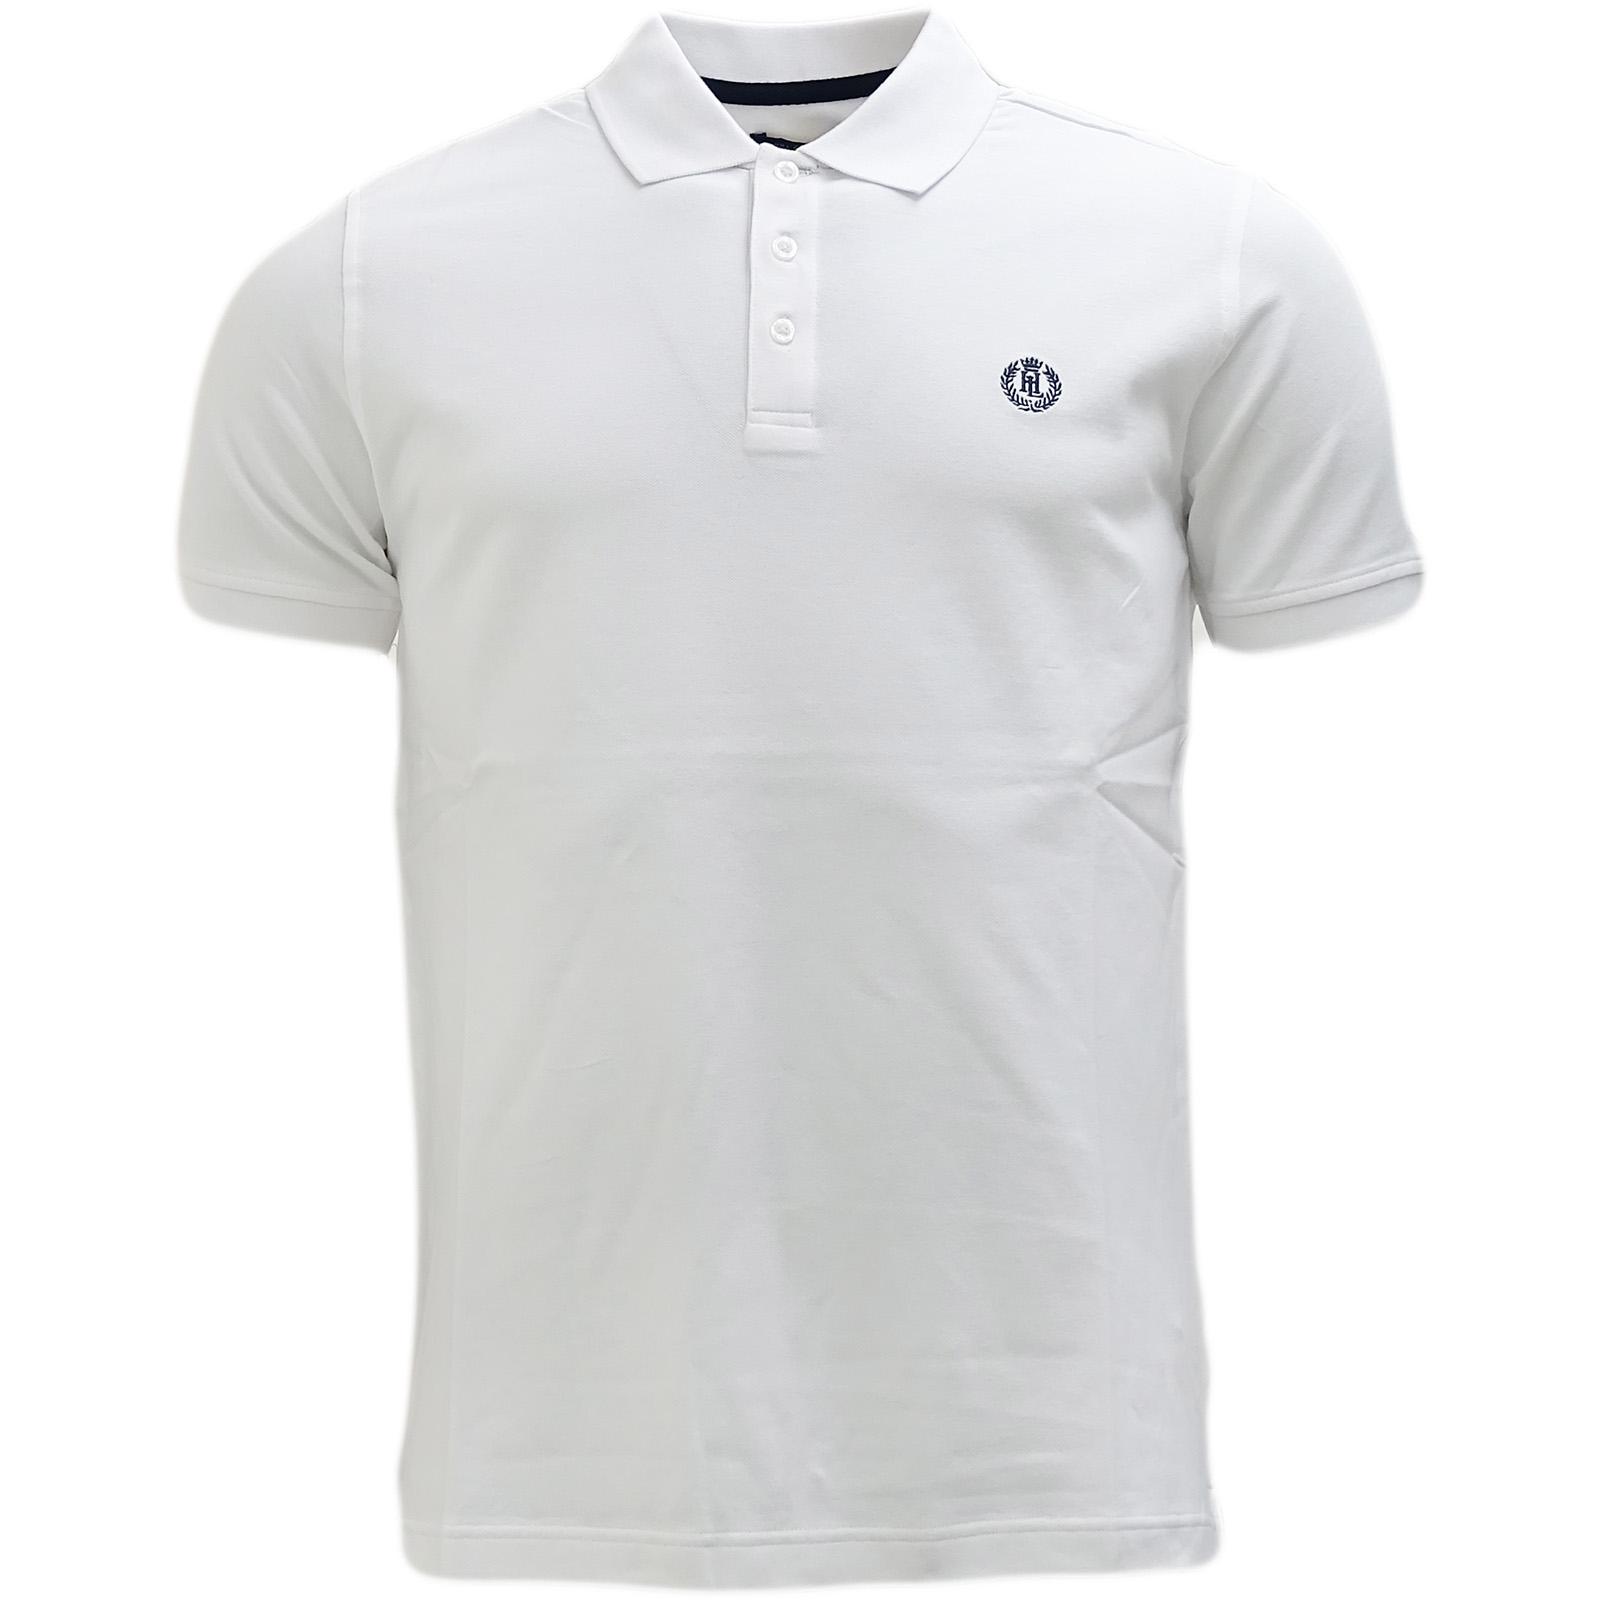 Cowes 18 Henri Lloyd Plain Stretch Polo Shirt